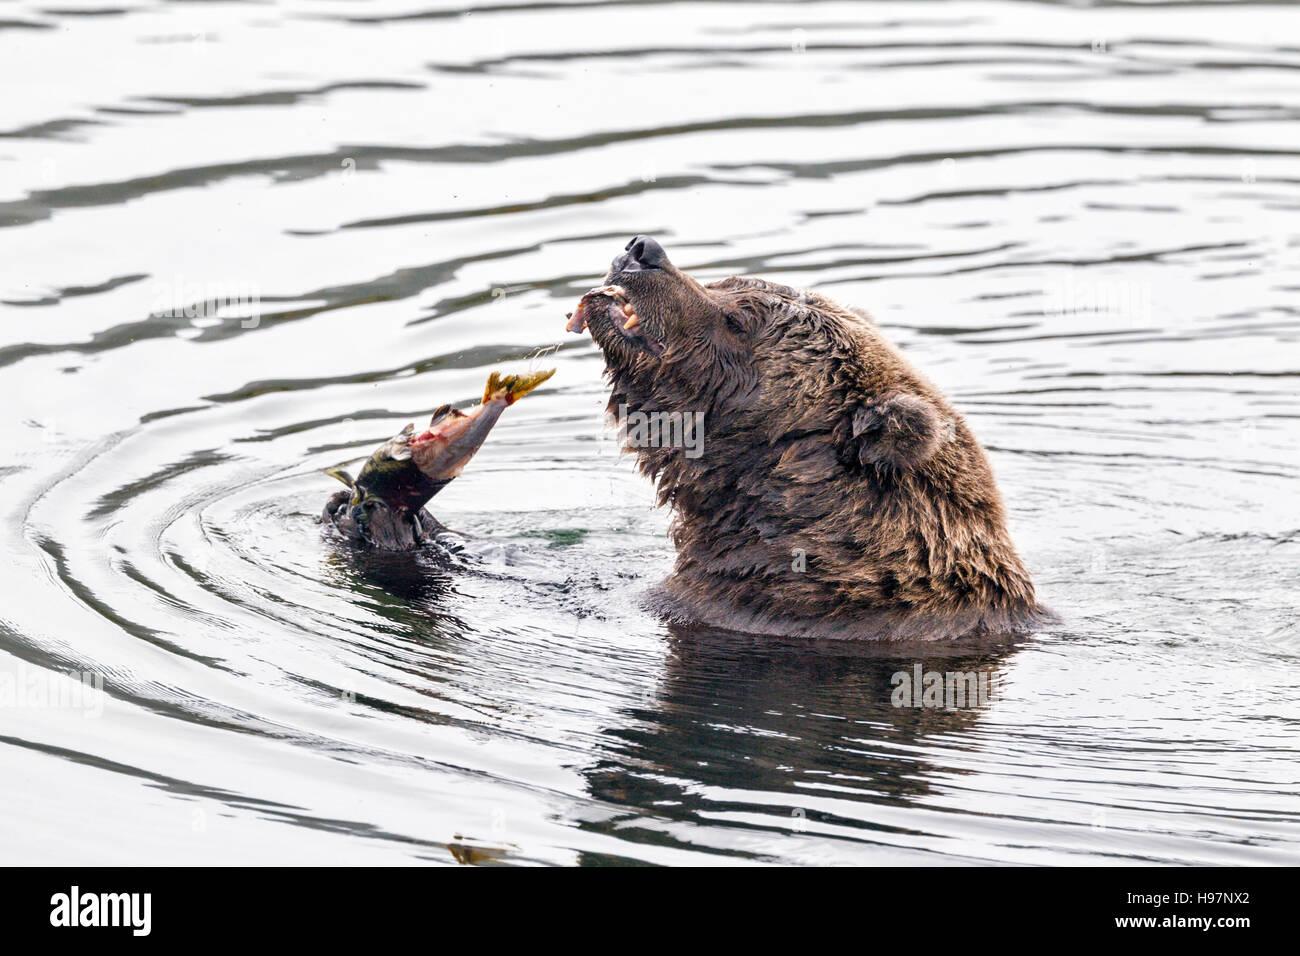 Female brown bear feasting on spawning salmon in Katmai National Park, Alaska - Stock Image